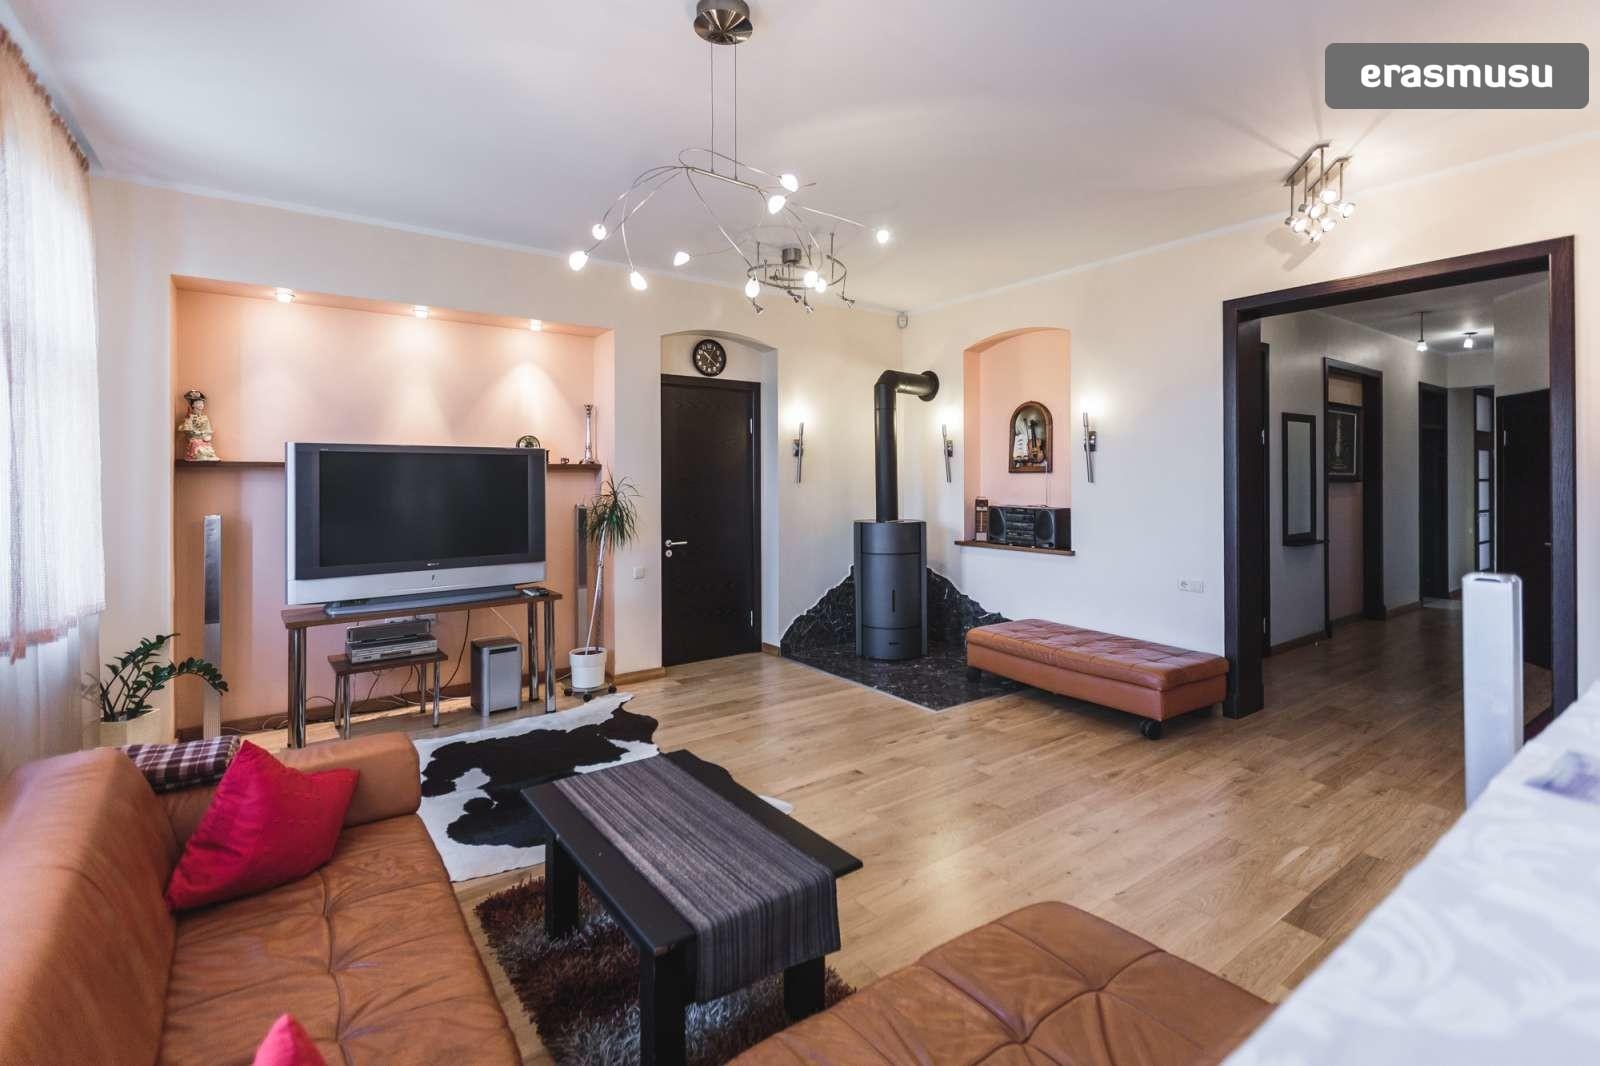 modern-4-bedroom-apartment-rent-centrs-cdea79bbc3d81fb12afbe86f1